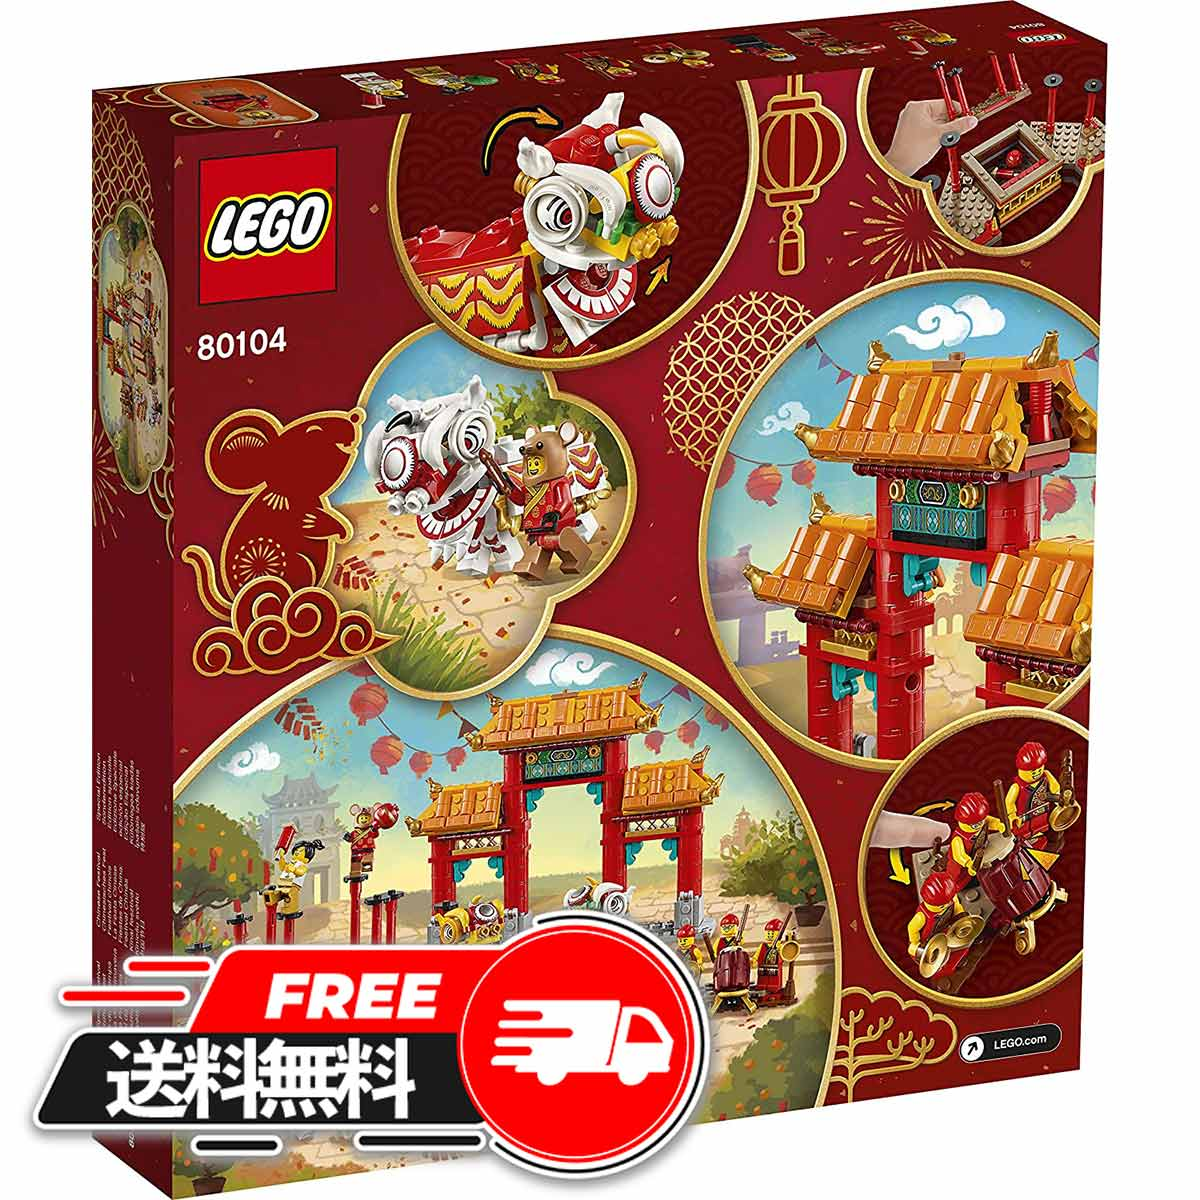 <title>レゴジャパン LEGO 80104 アジアンフェスティバル 獅子舞 廃盤 廃盤品 返品送料無料</title>